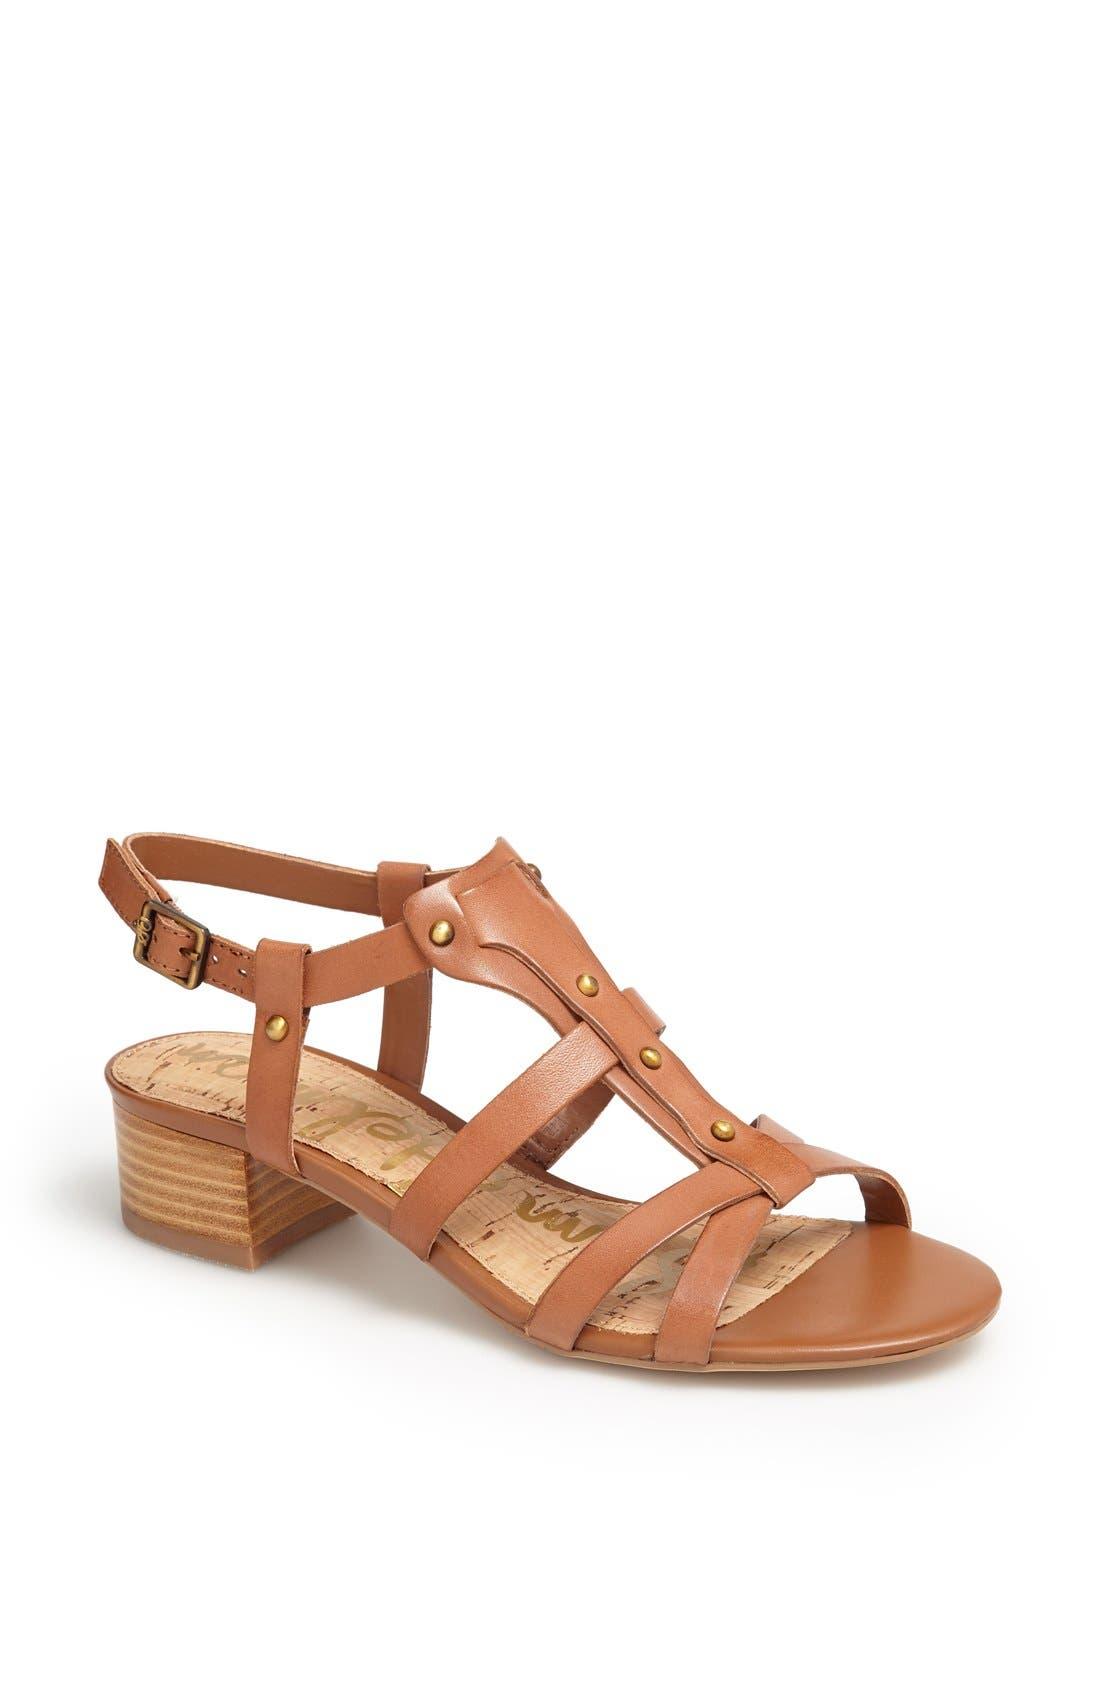 Alternate Image 1 Selected - Sam Edelman 'Angela' Sandal